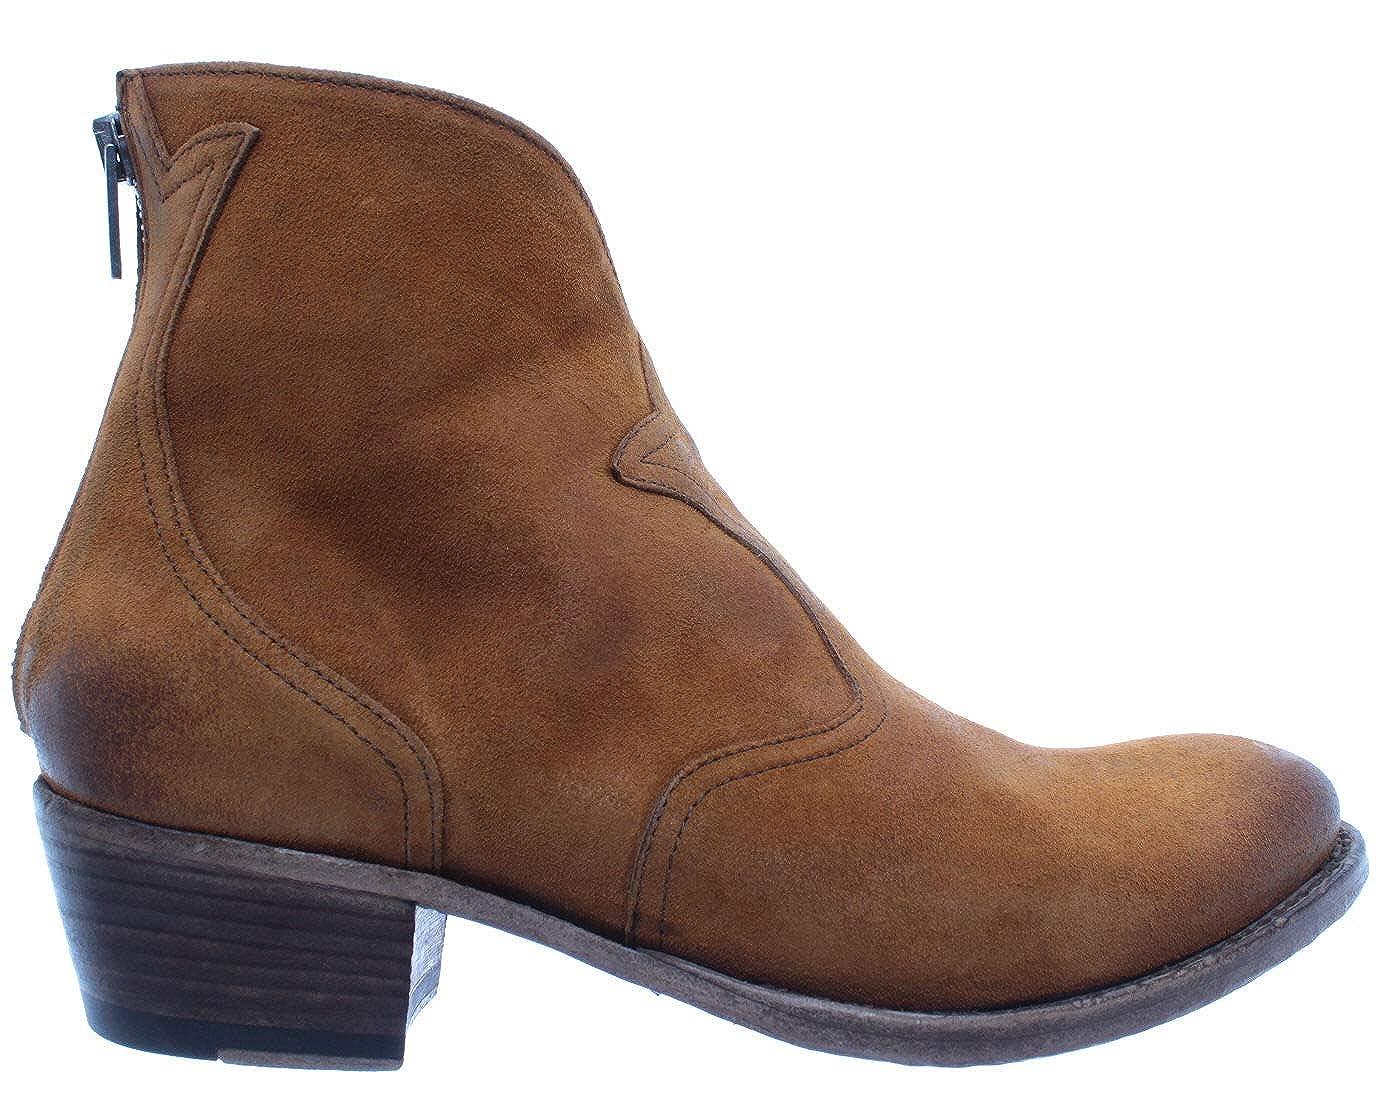 Bottines 12162b Cuoio Chaussures Bolero Cacao Roser Femme Pantanetti doBxeC